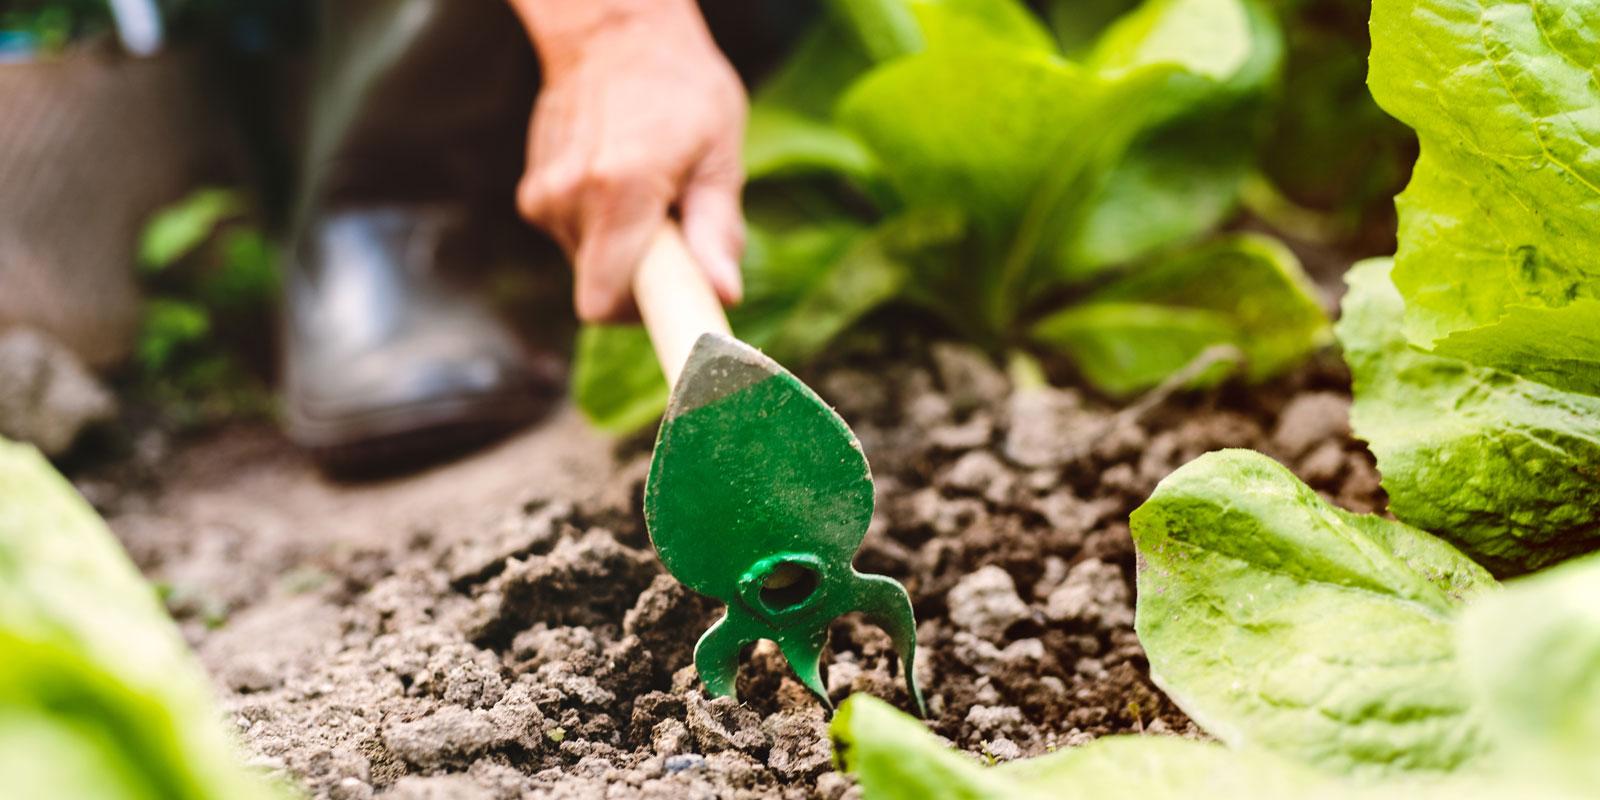 Hoeing Your Garden